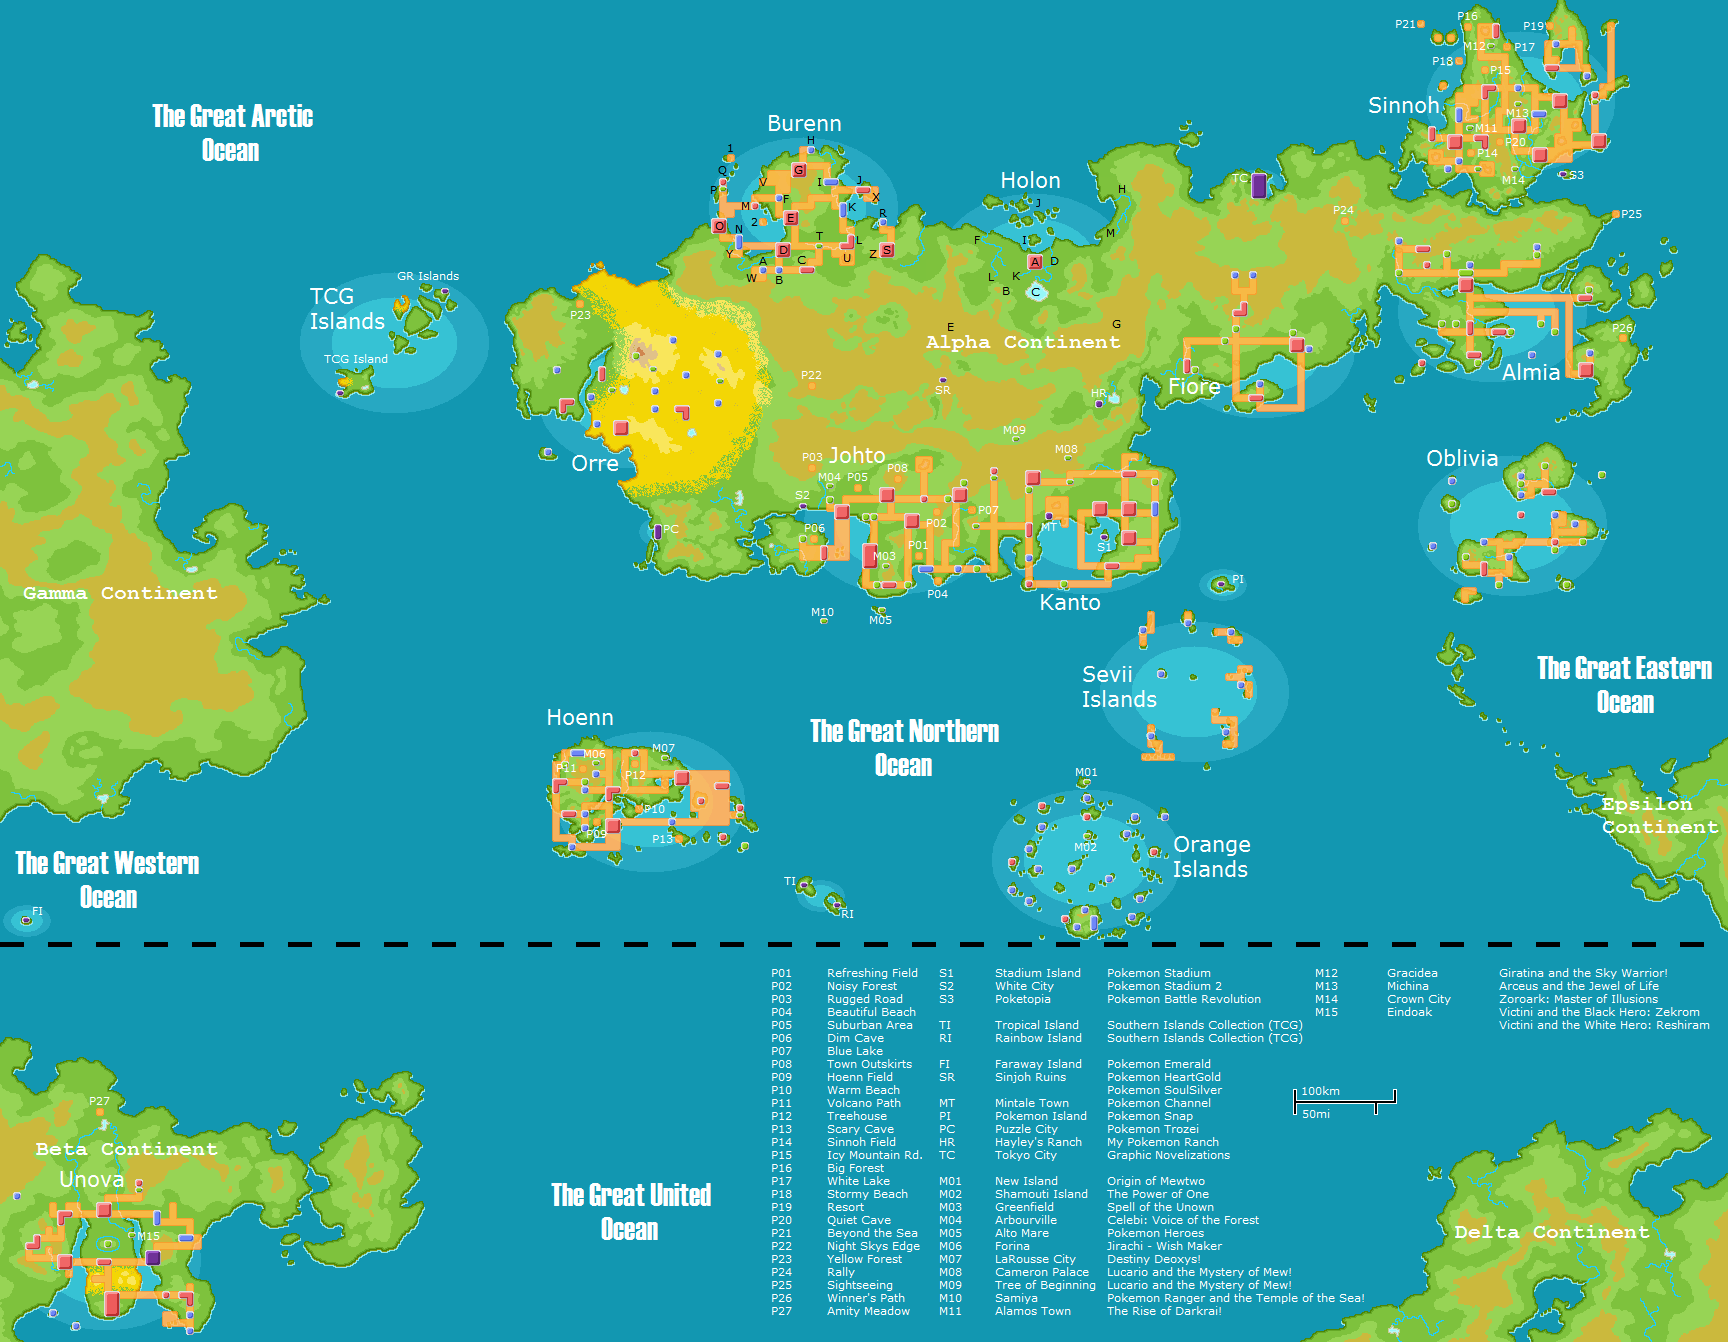 My Pokemon World Map v6.0 by JamisonHartley on DeviantArt